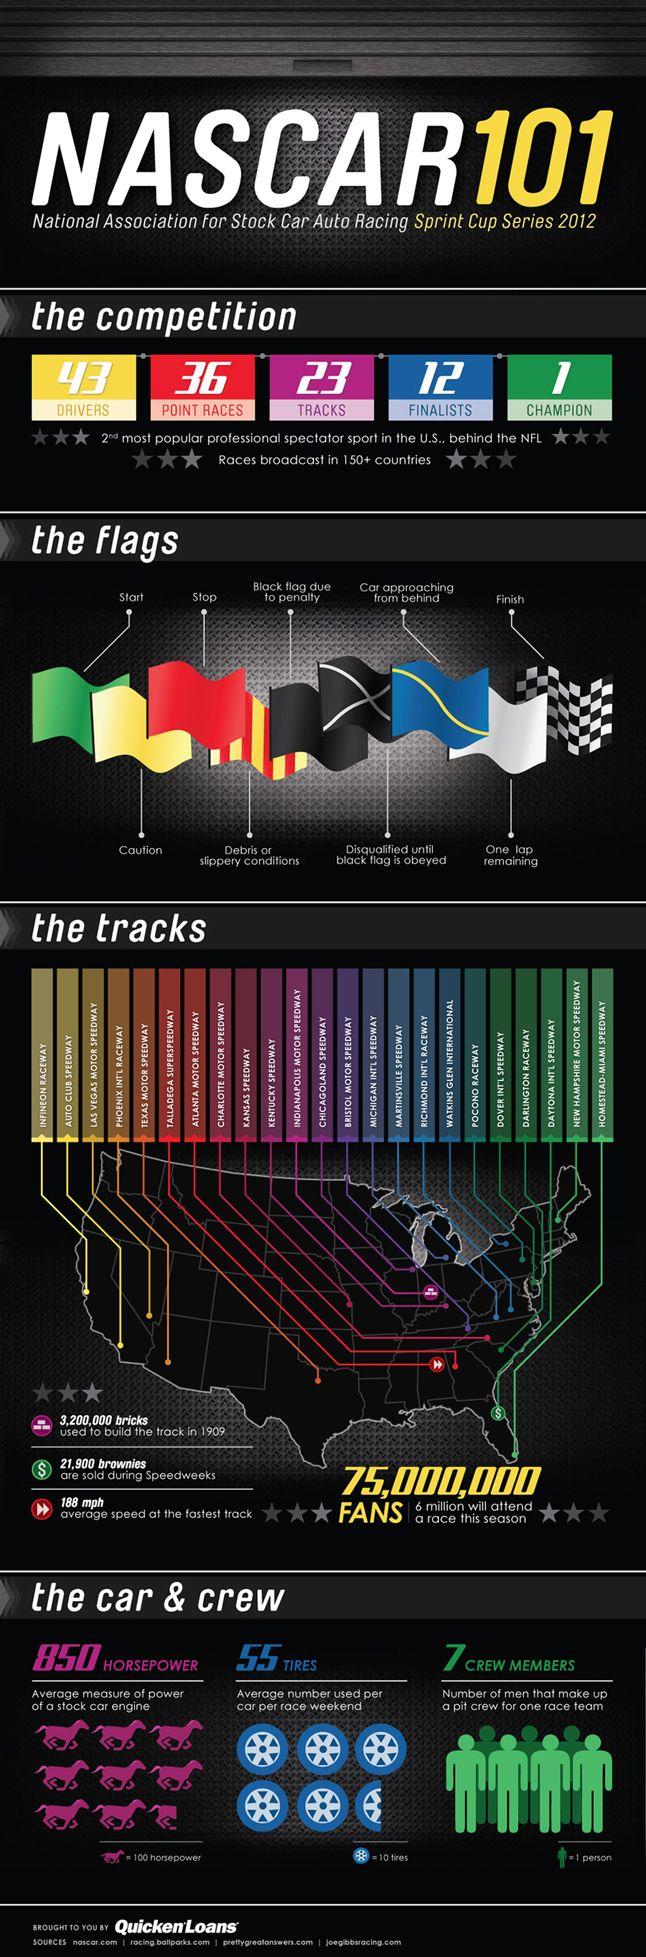 NASCAR Explained in Infographic | AutoGuide.com News